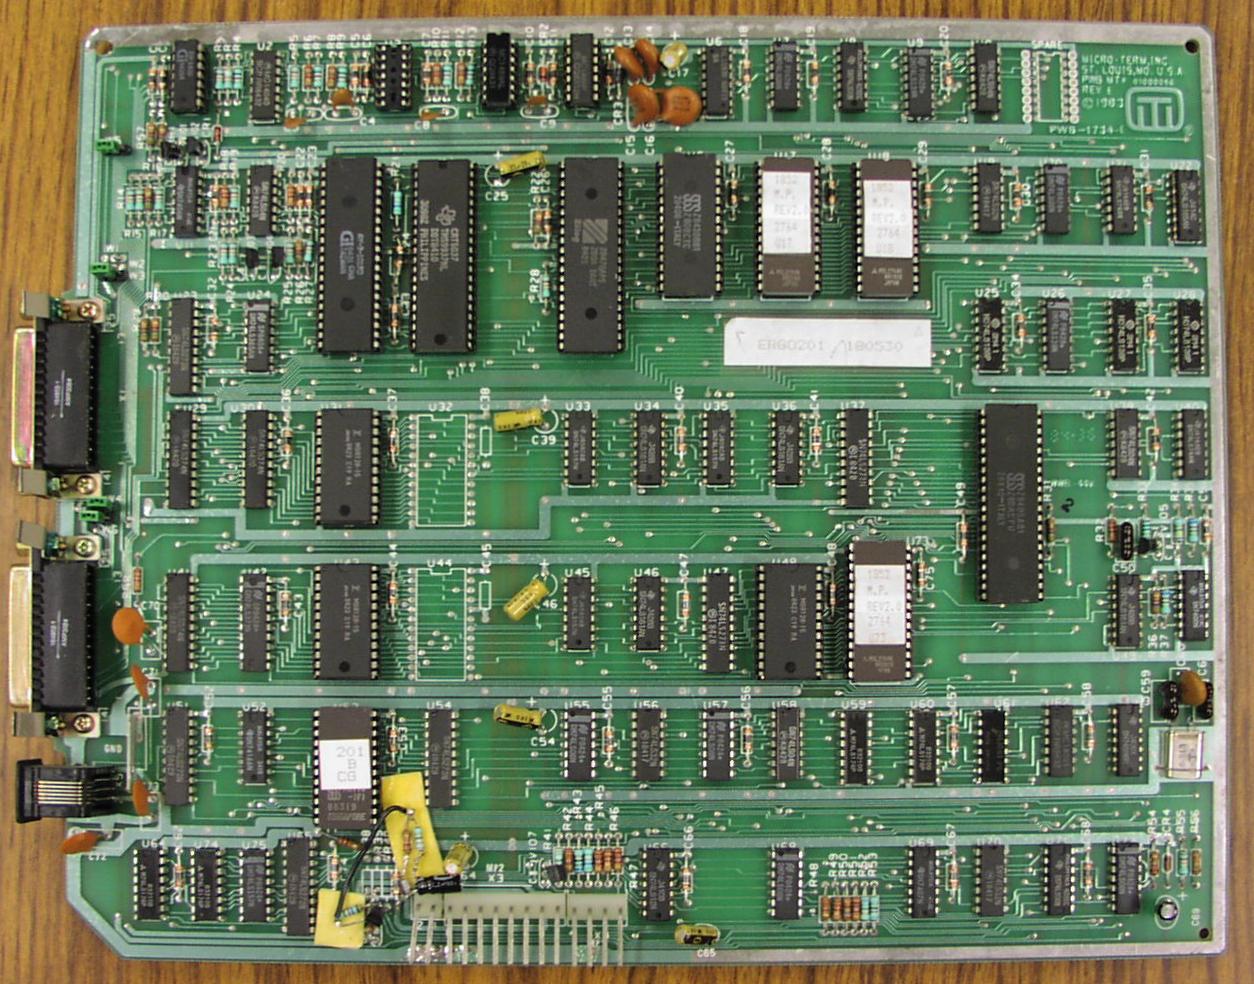 File:Computer-photo-Micro Ter